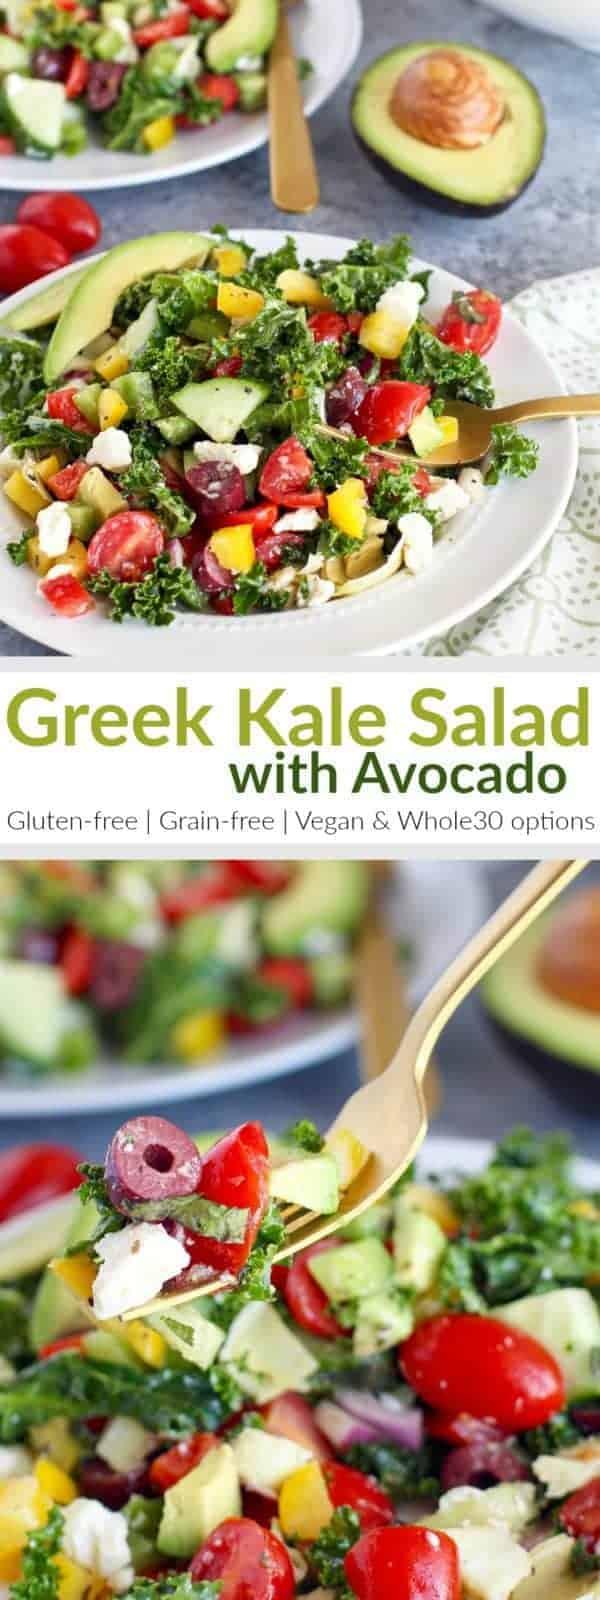 pinterest image for Greek Kale Salad with Avocado